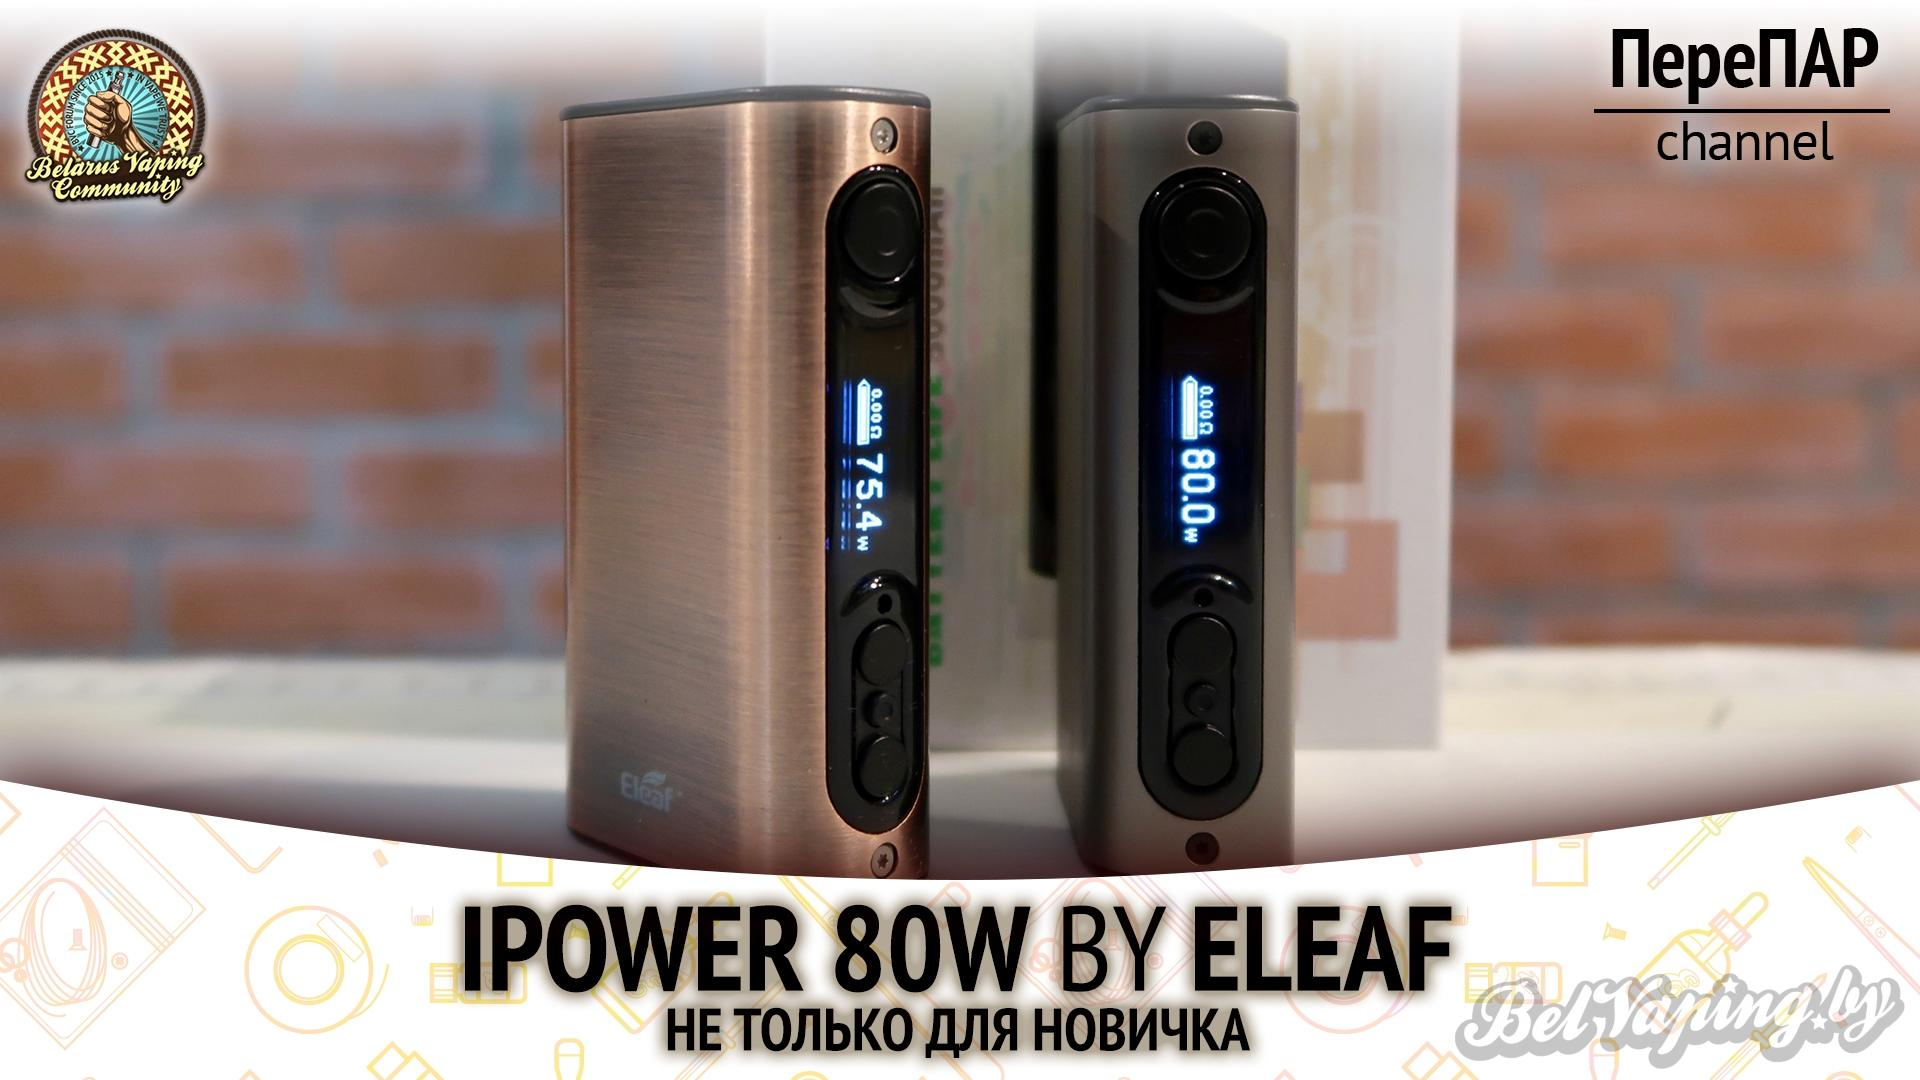 Видеообзор боксмода iPower 80W от Eleaf